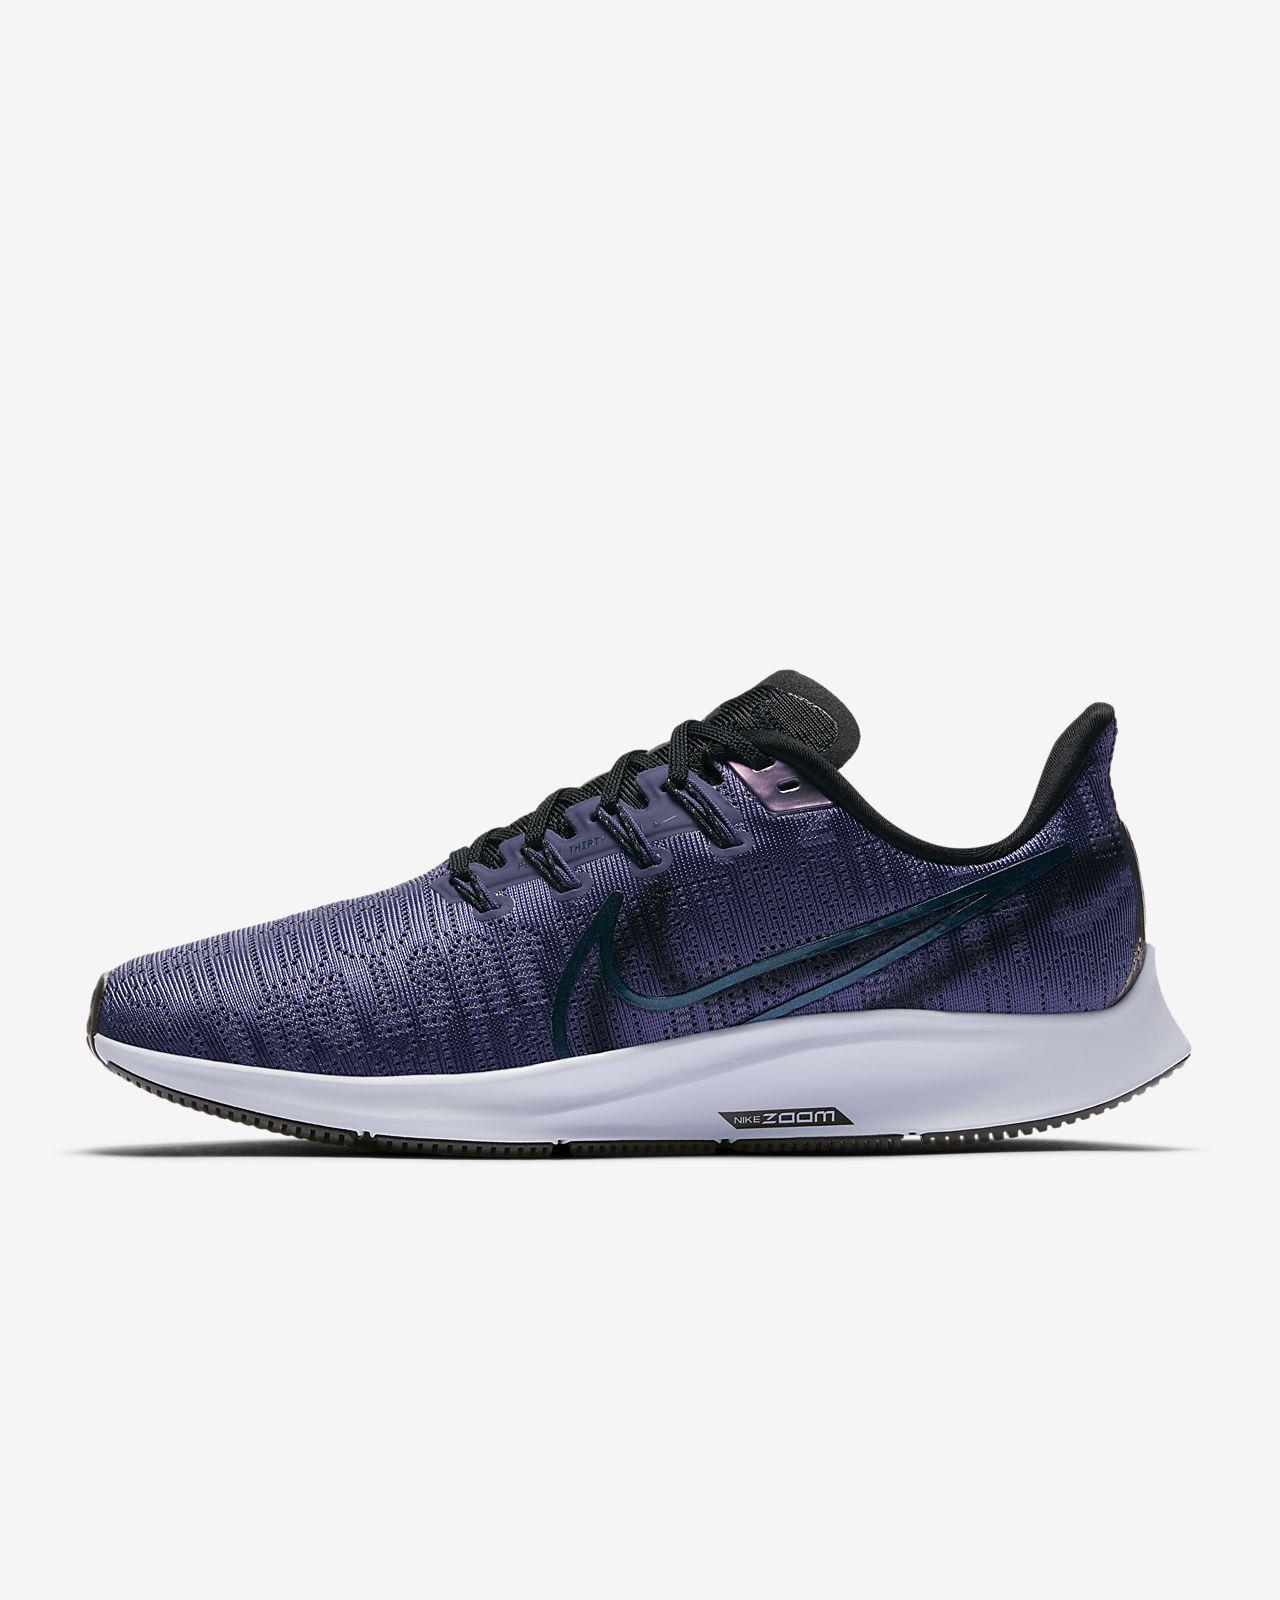 Löparsko Nike Air Zoom Pegasus 36 Premium Rise för kvinnor